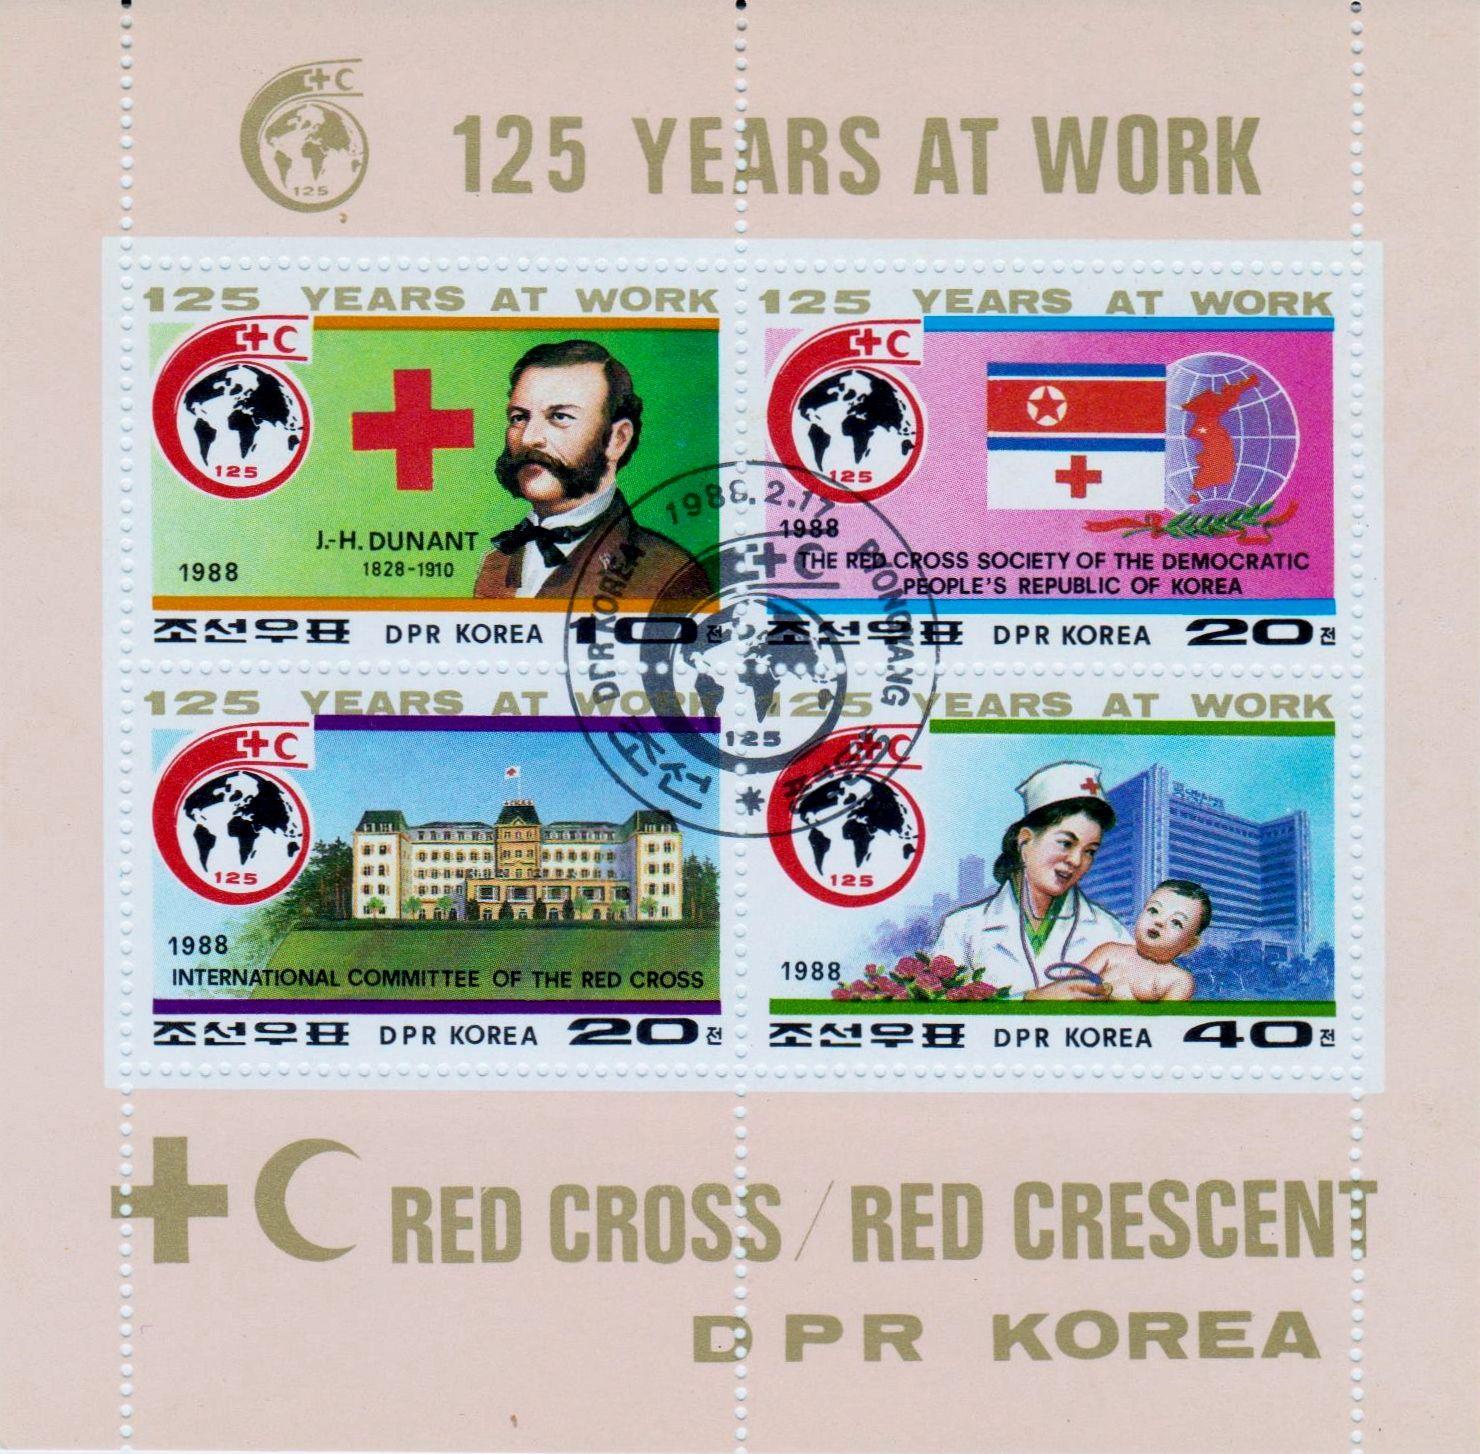 South Korea - 125th Anniversary of the International Red Cross. February 17, 1988.